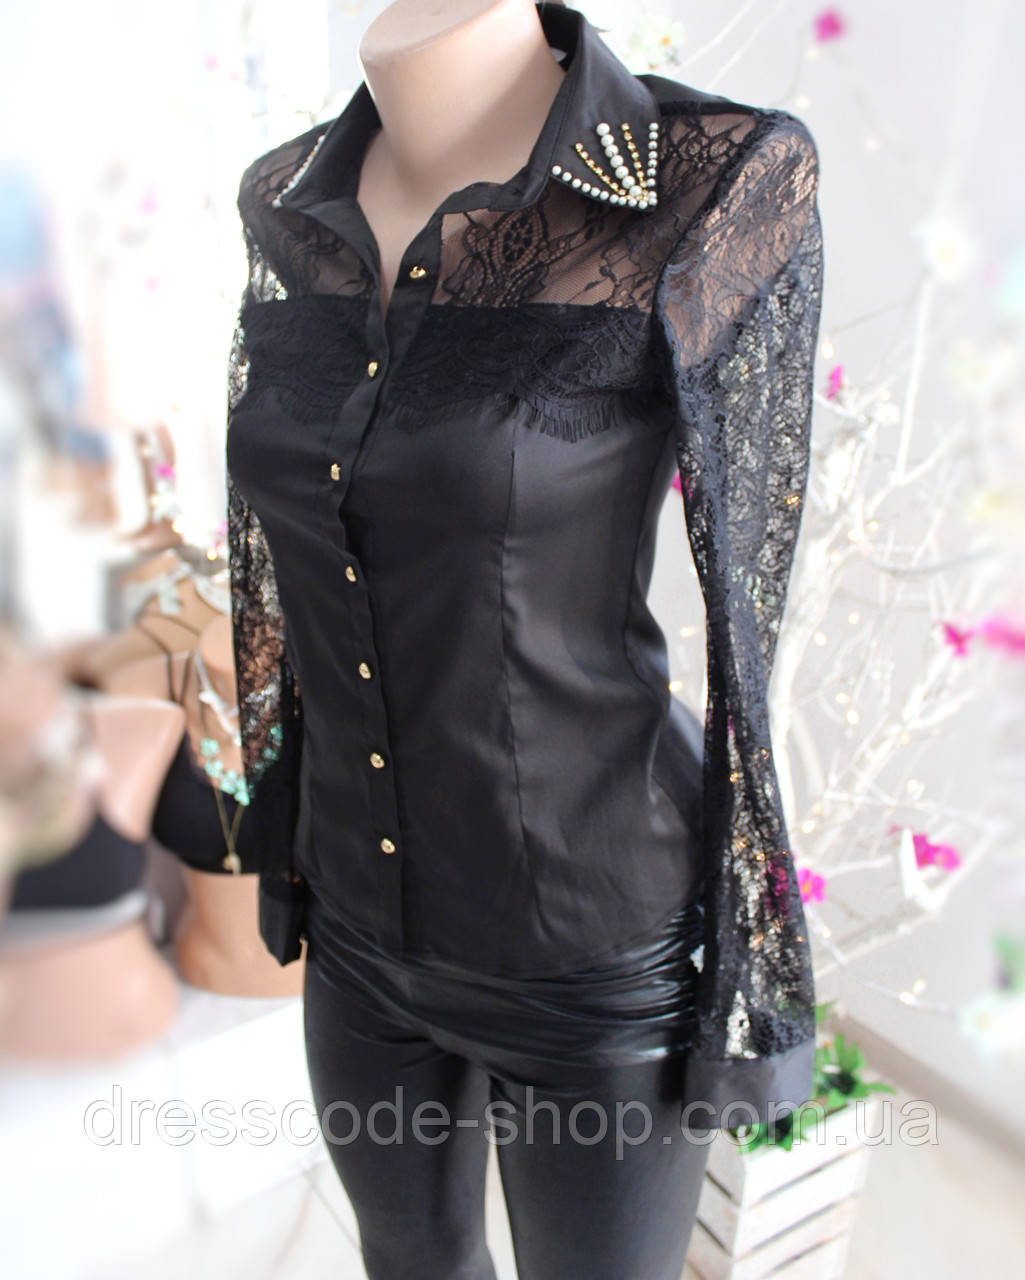 46abb133a63 Черная блуза с кружевными рукавами